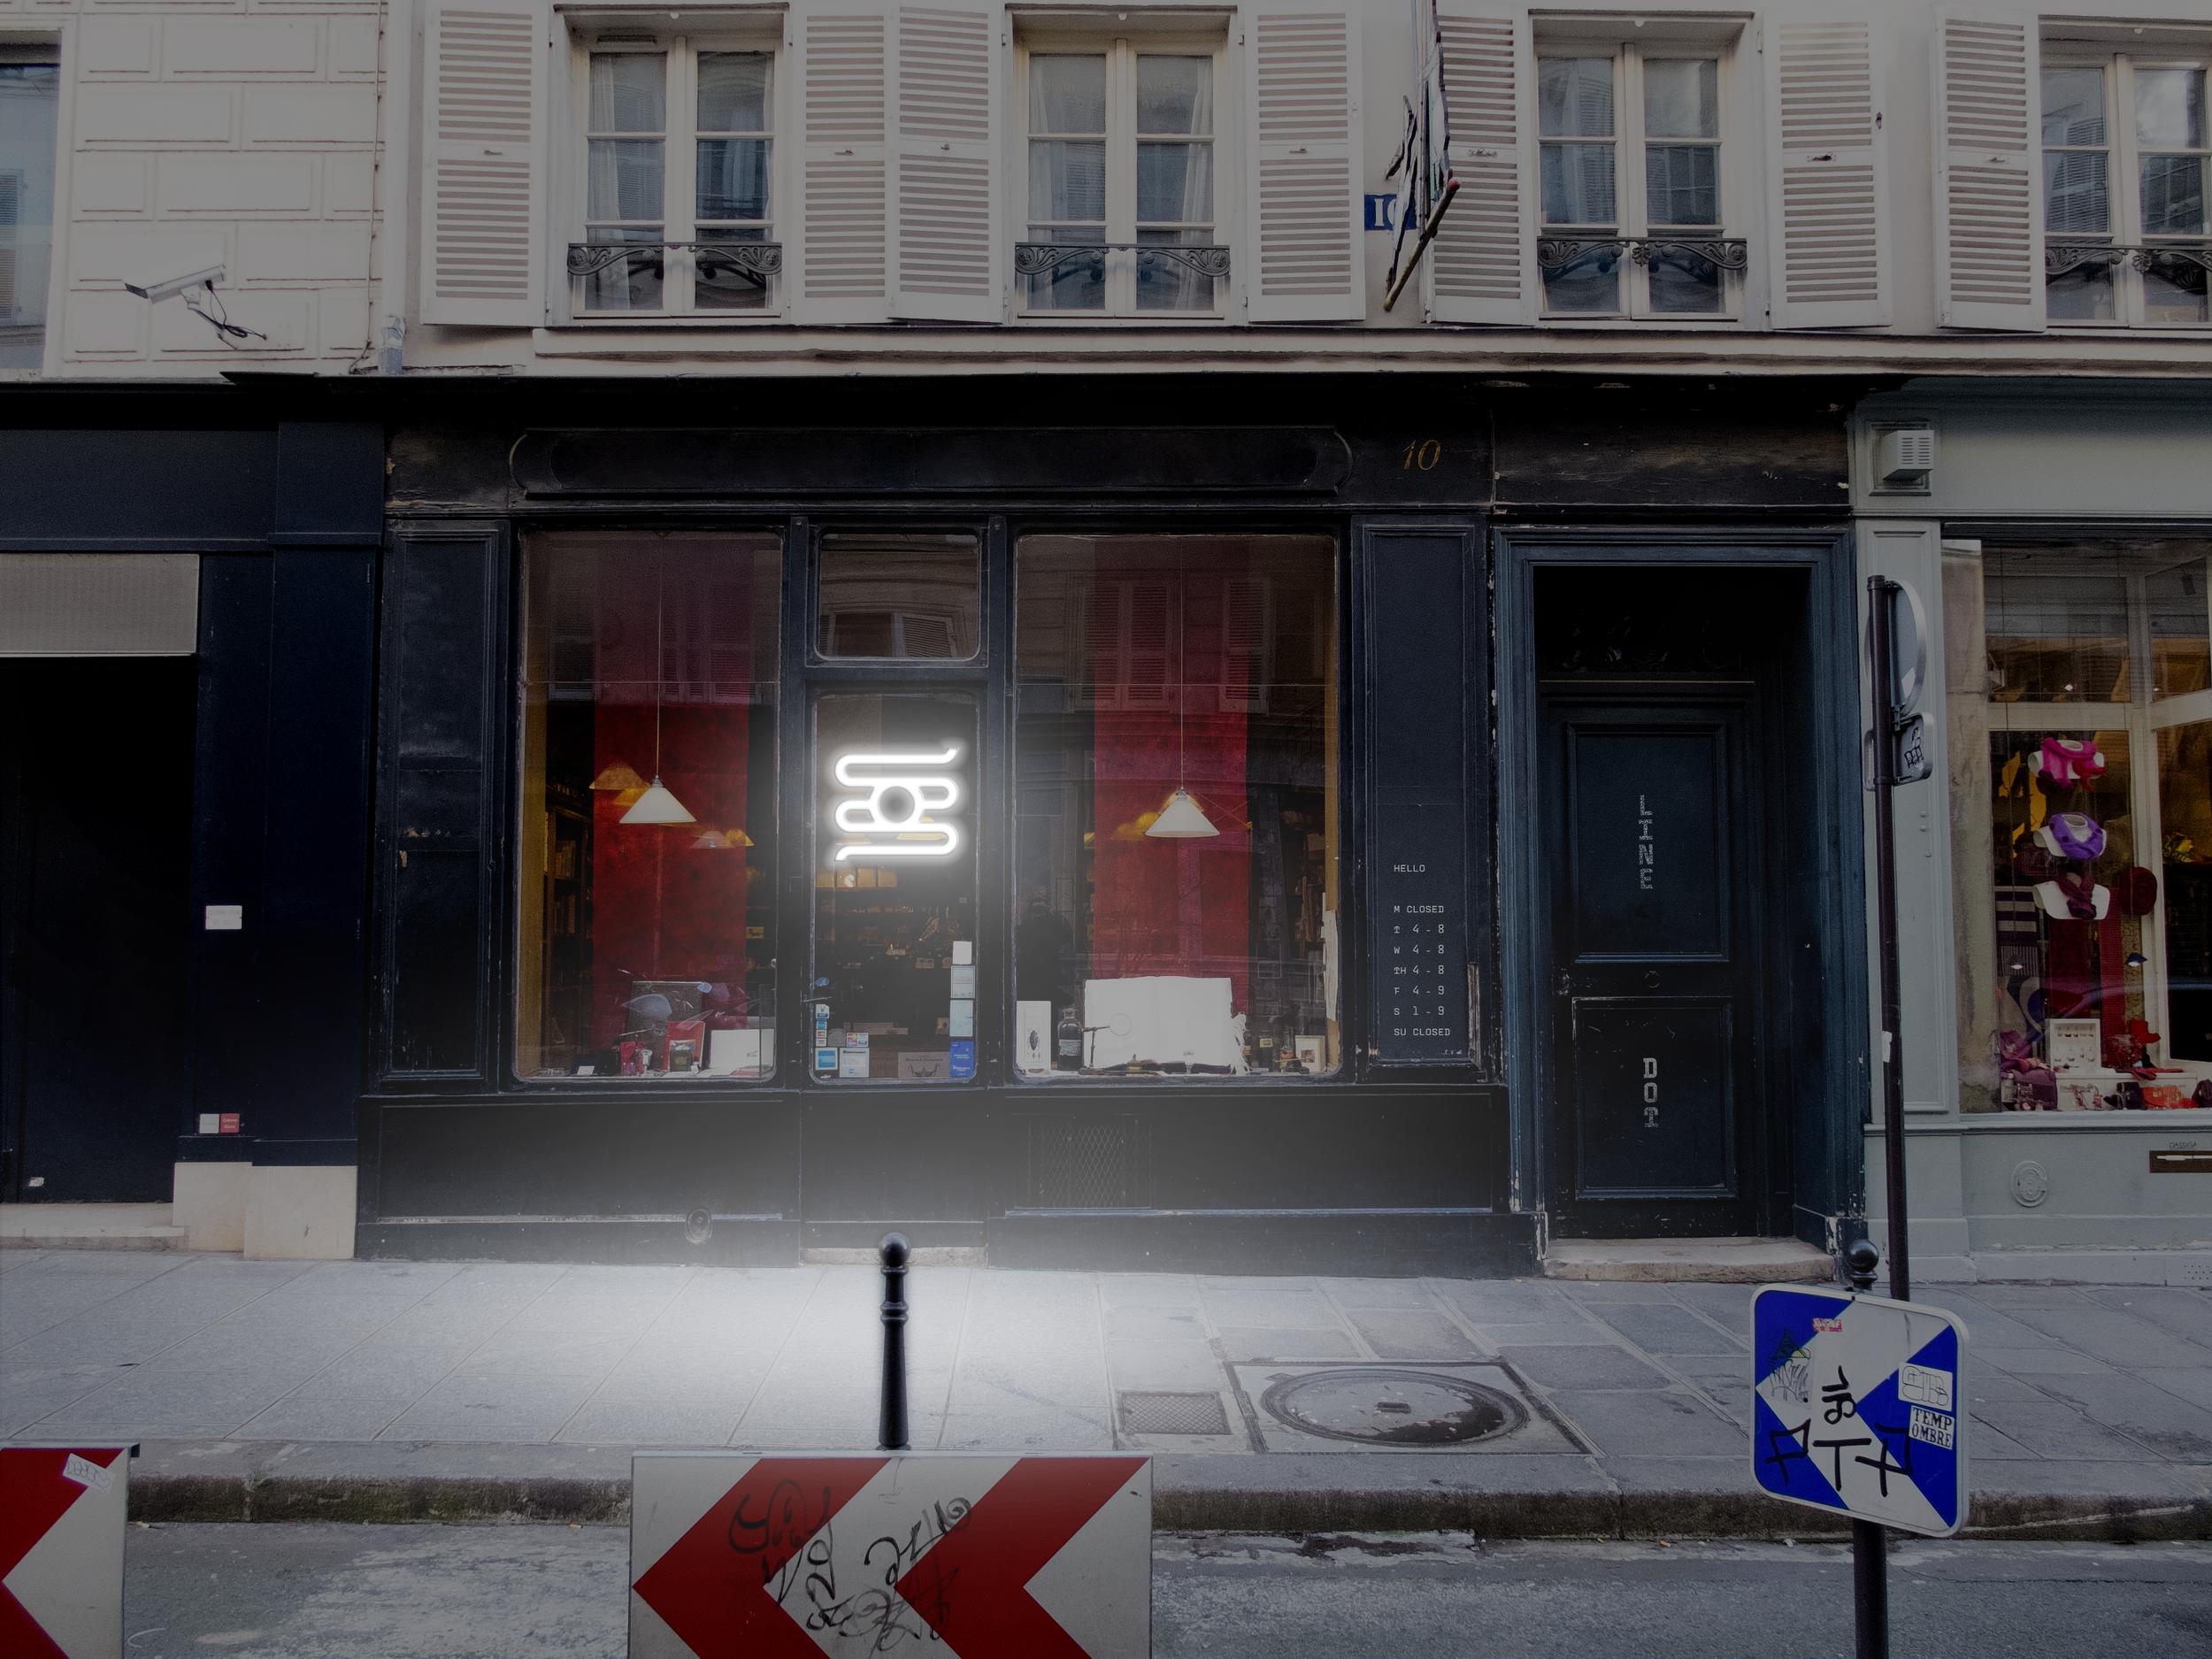 linedot_facade_150727.png